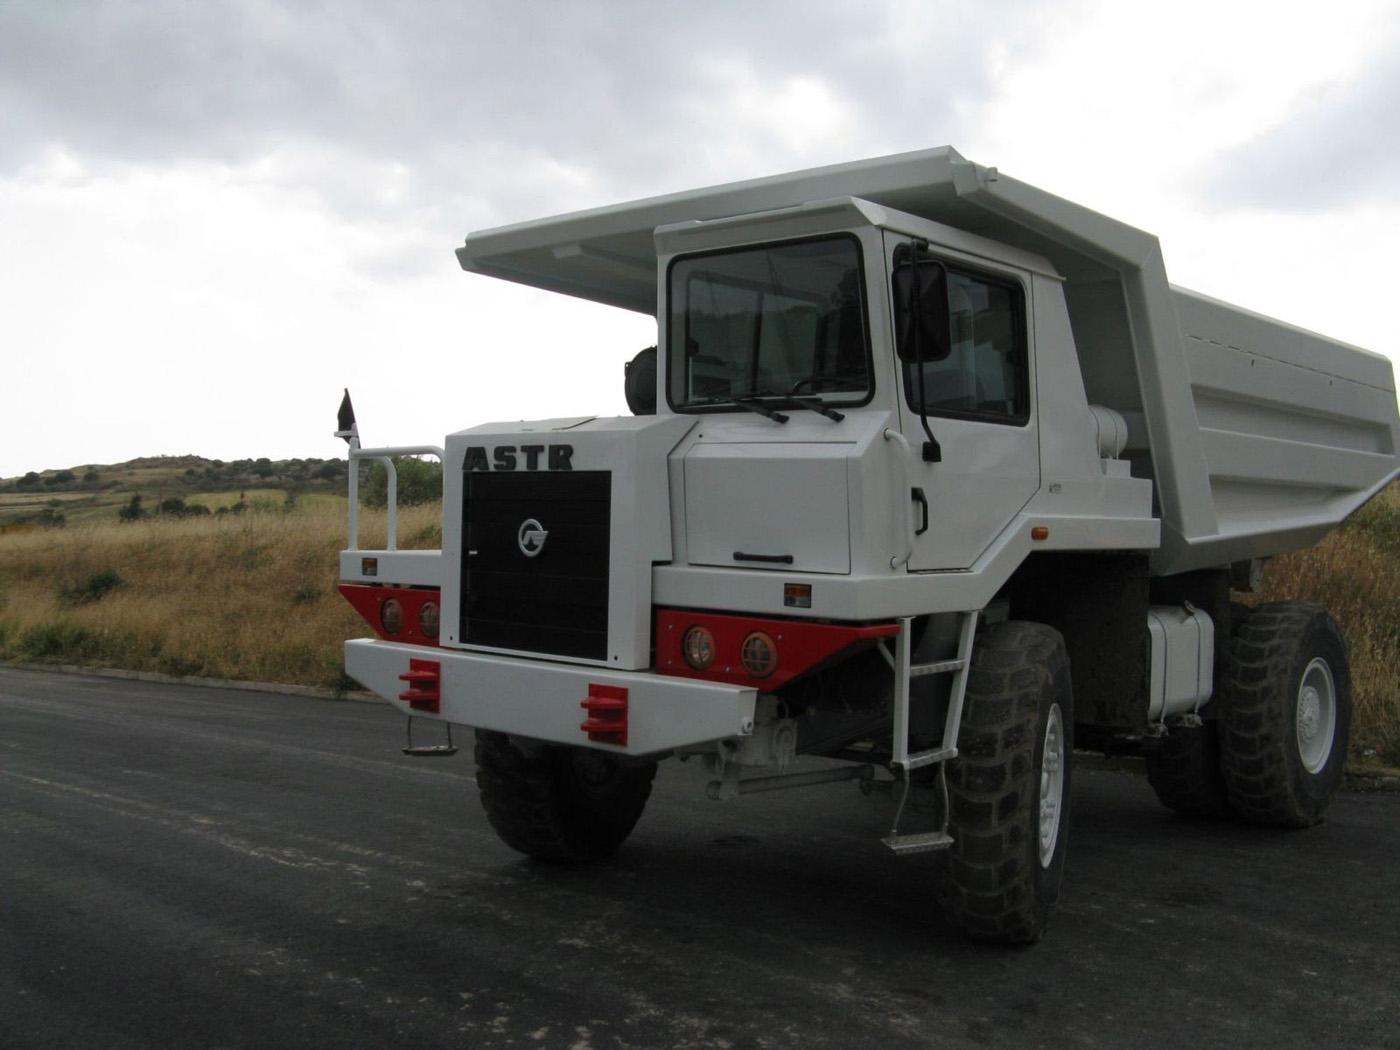 Astra BM501